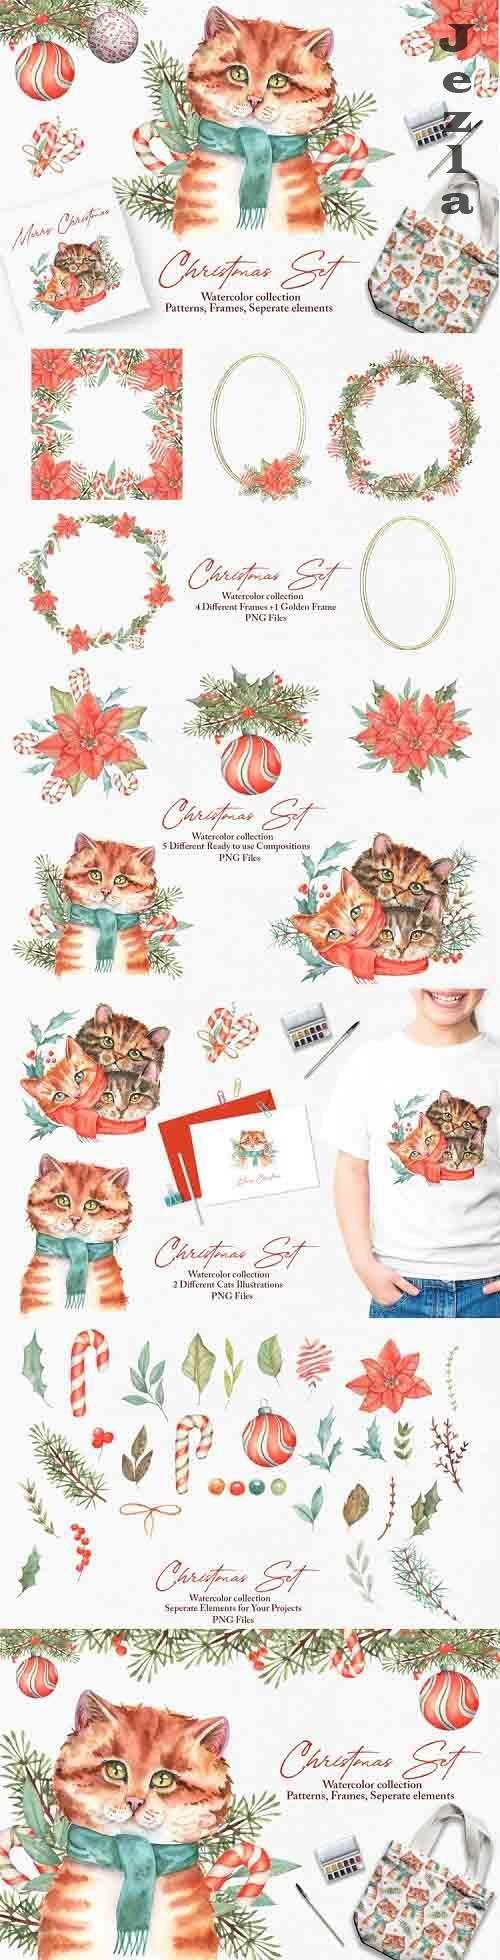 Watercolor Christmas Set - 1038577